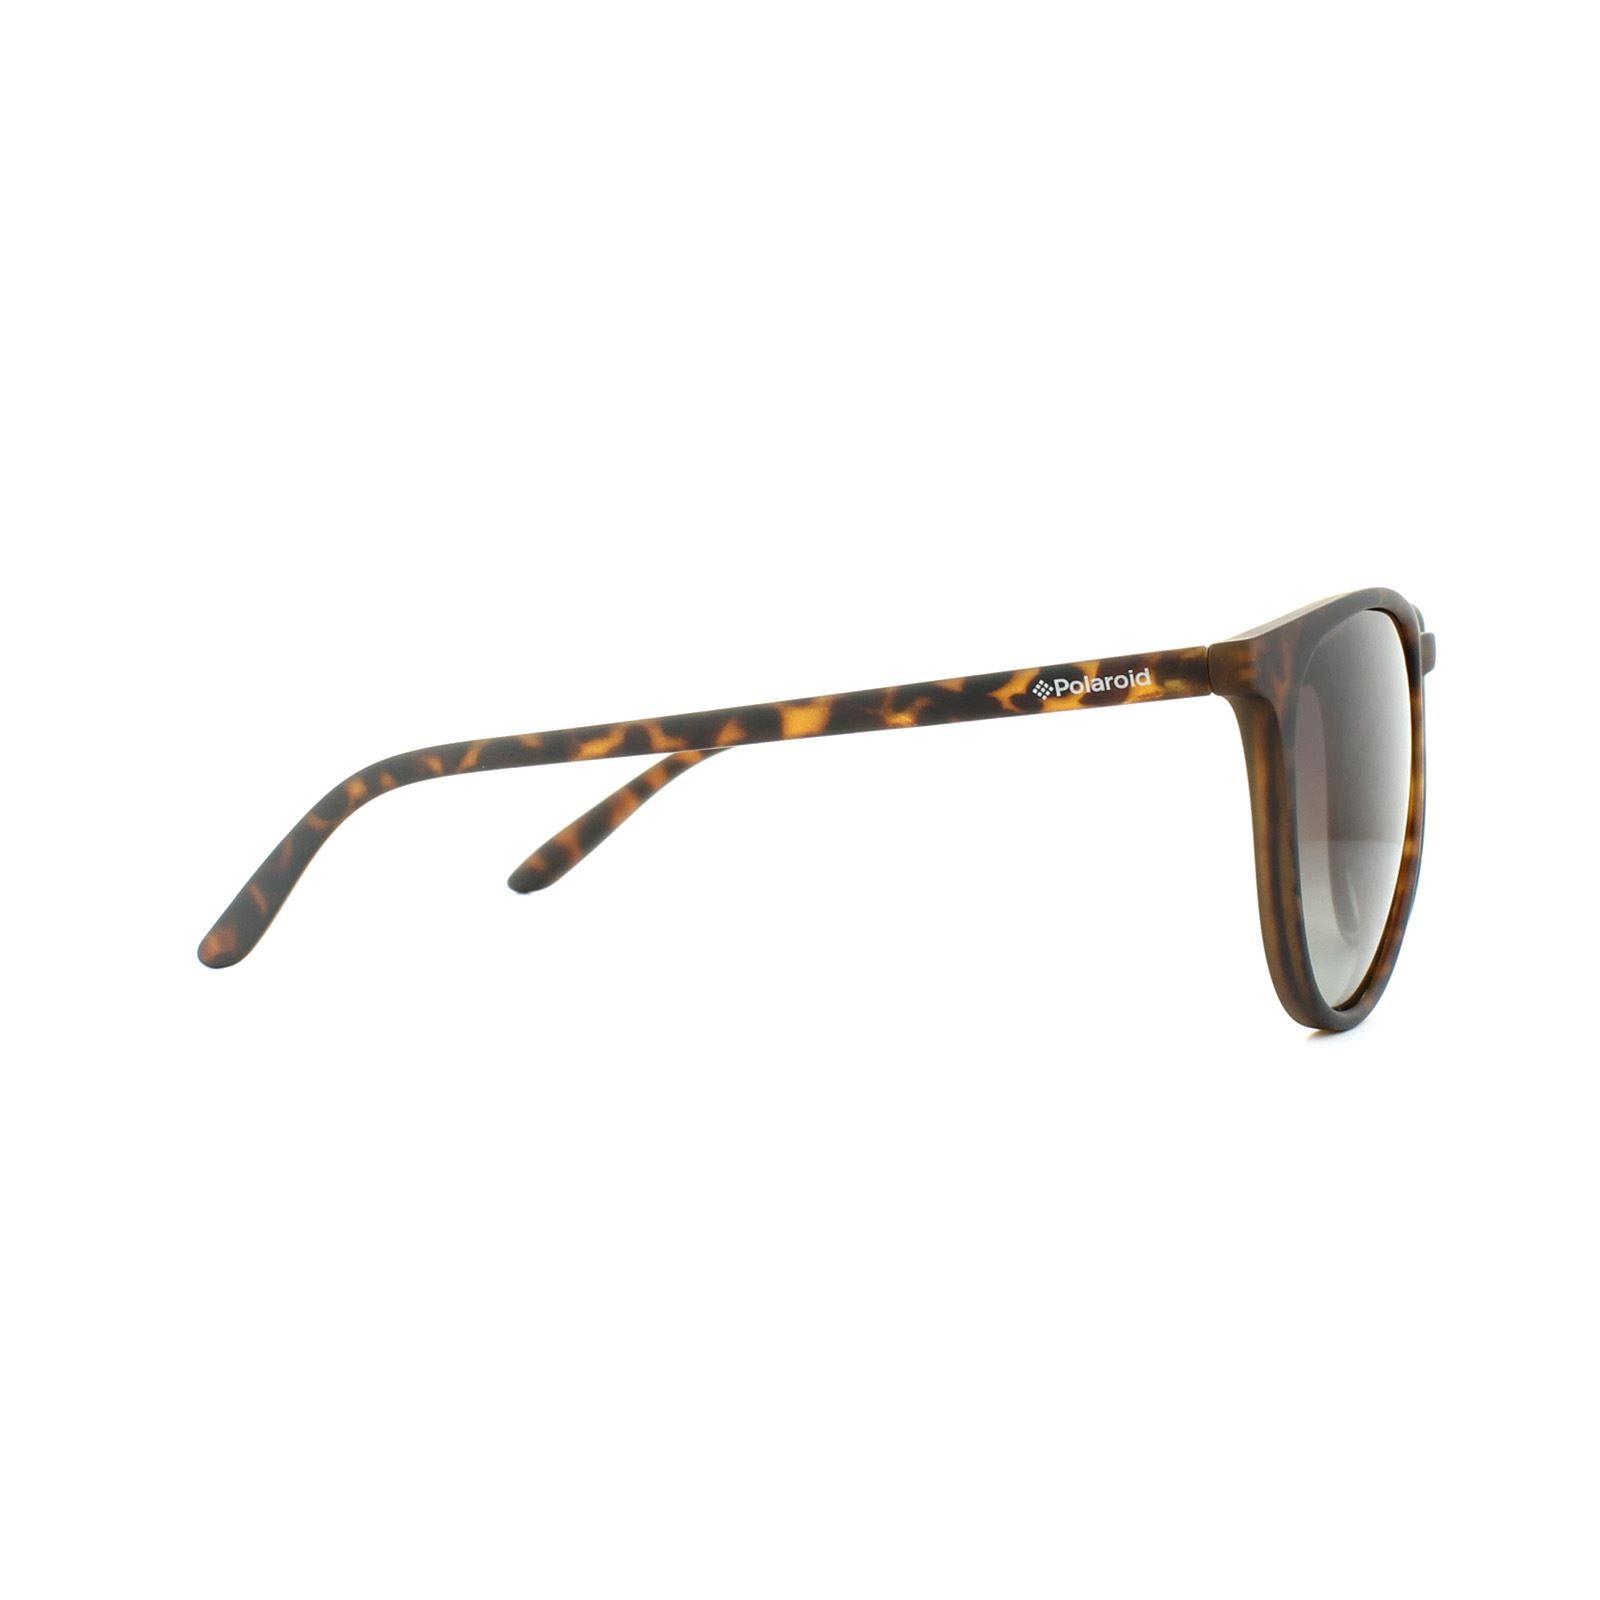 Polaroid Sunglasses PLD 6003/N/S V08 LA Havana Brown Gradient Polarized